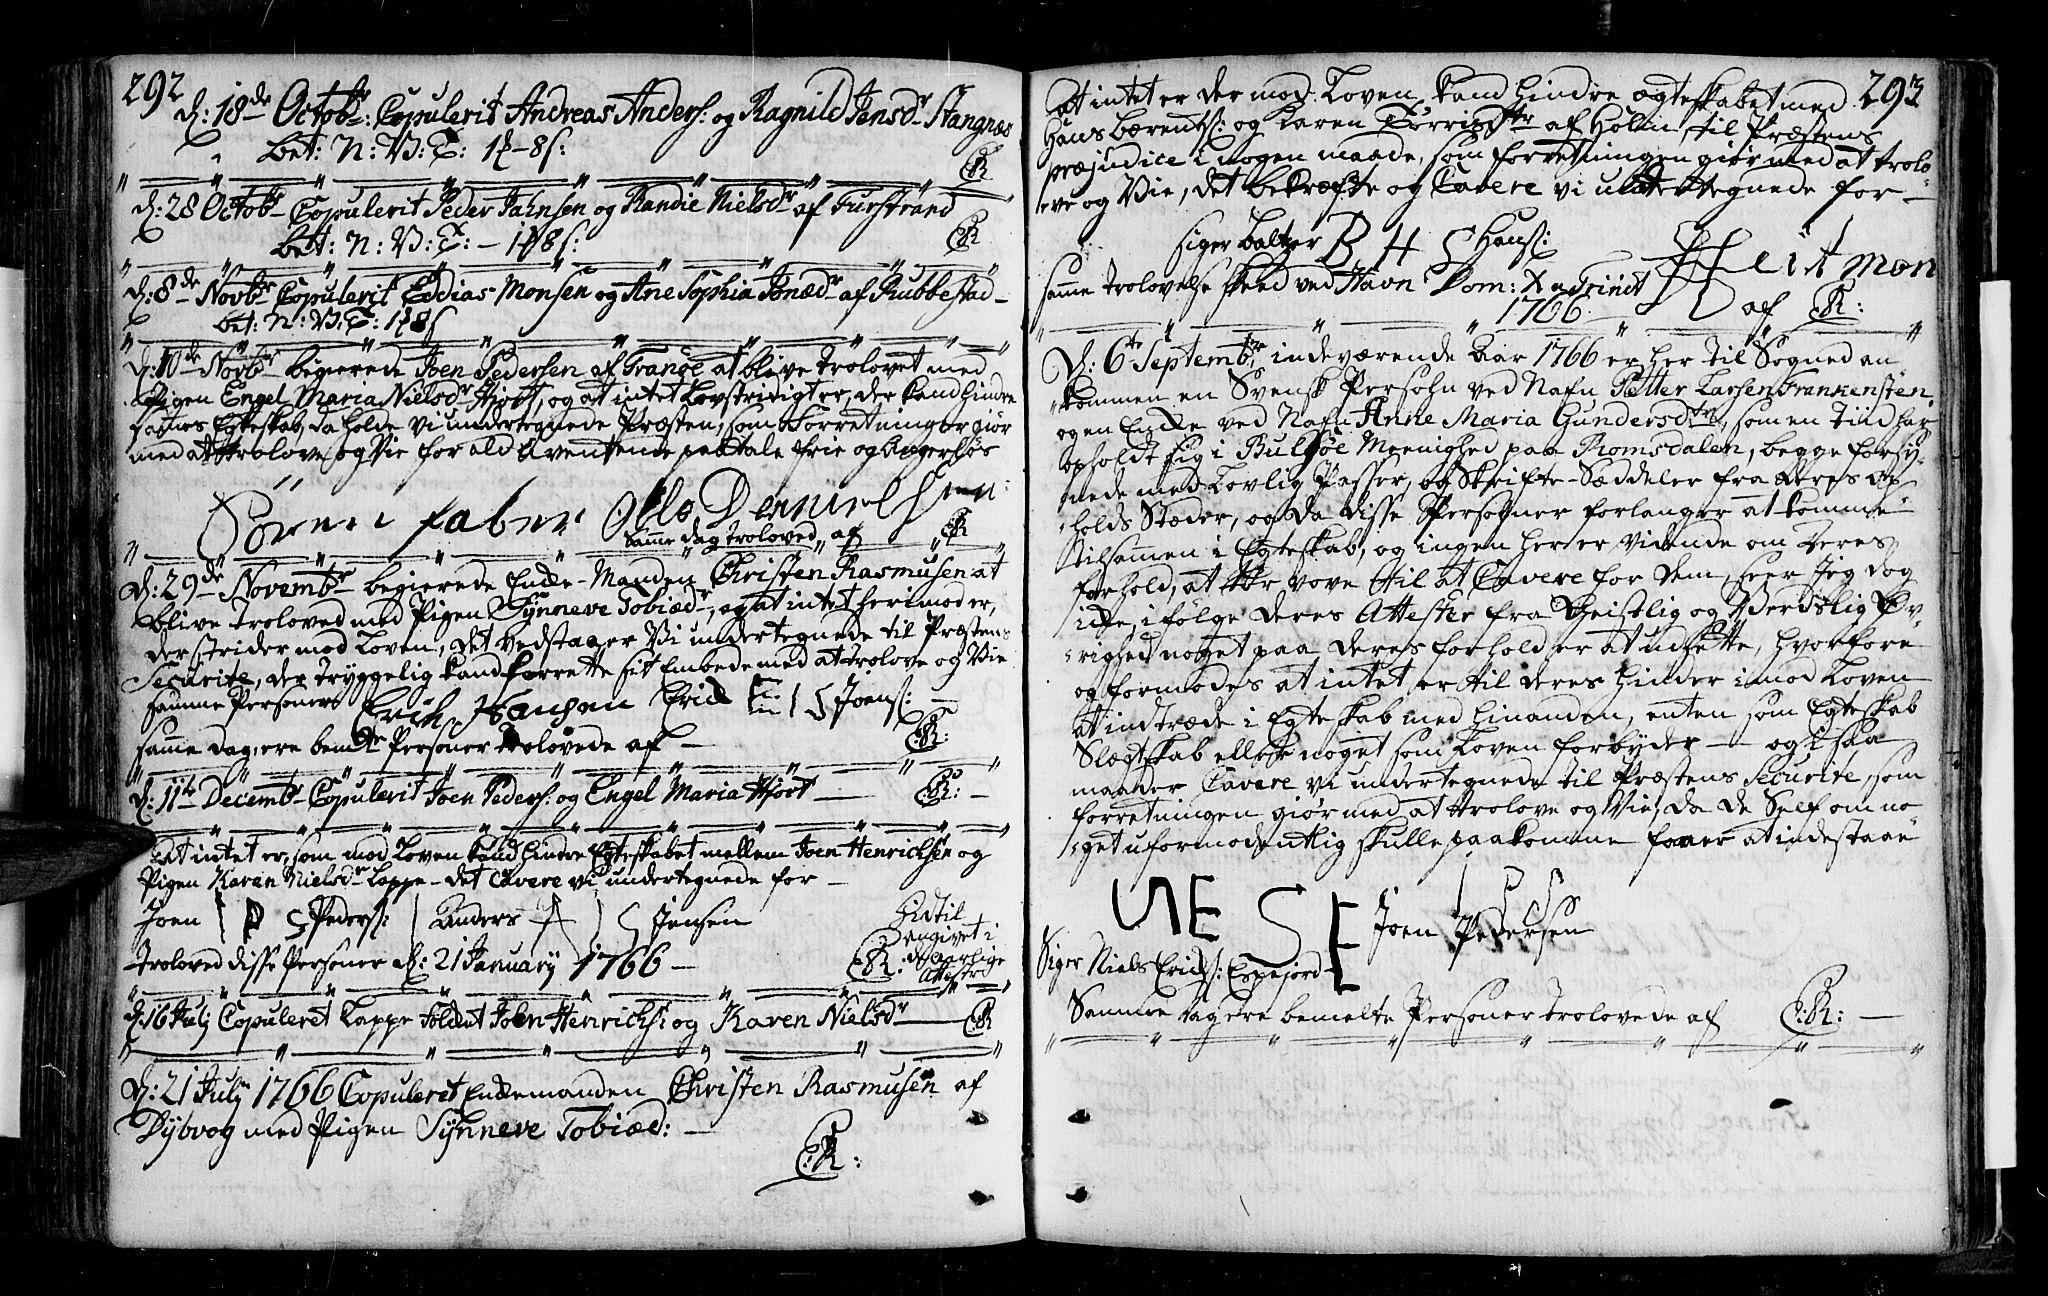 SATØ, Tranøy sokneprestkontor, I/Ia/Iaa/L0001kirke: Ministerialbok nr. 1, 1757-1773, s. 292-293